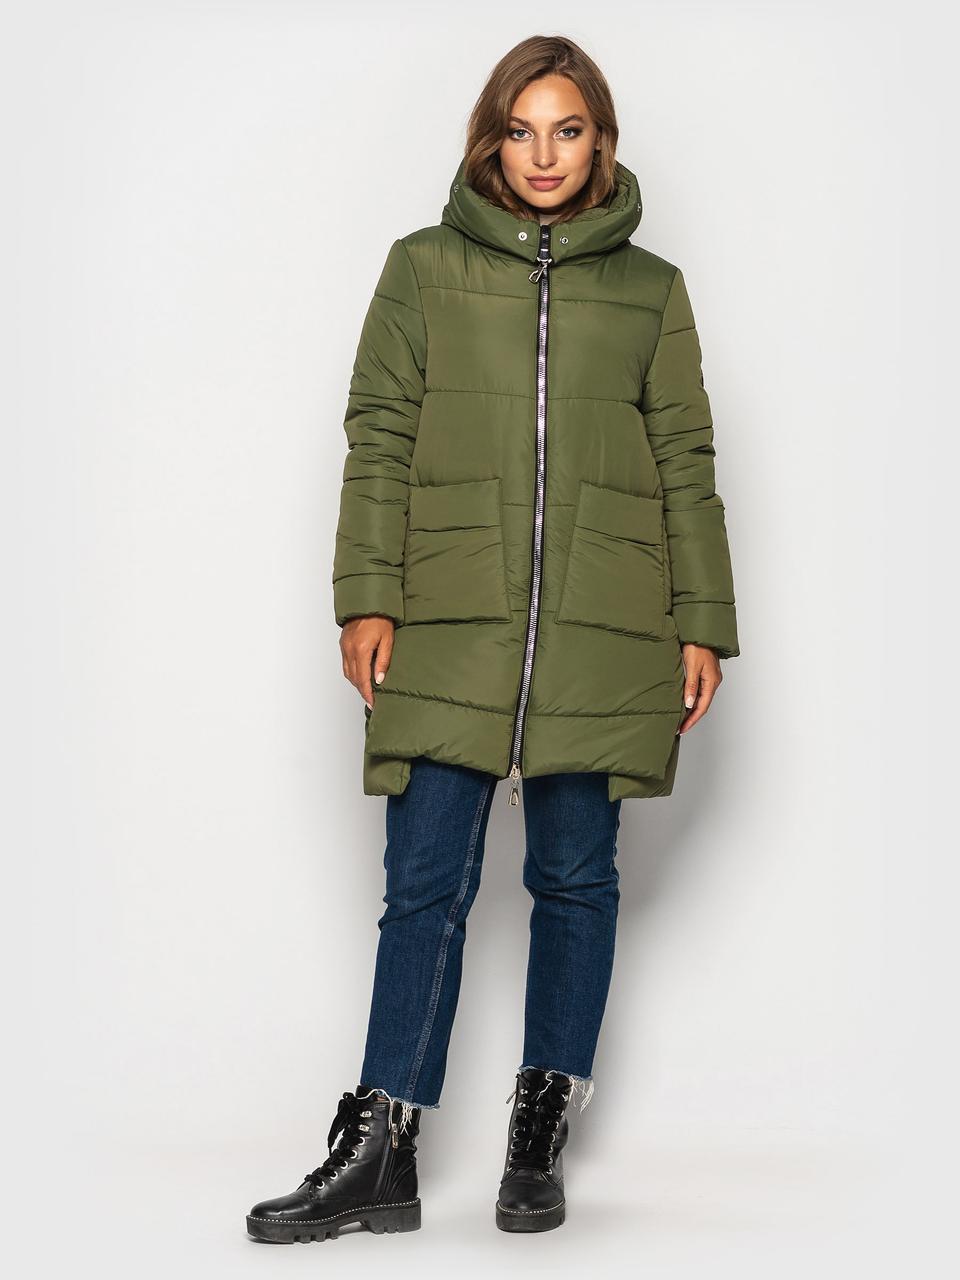 Модная зимняя куртка Лузанна хаки(44-54)